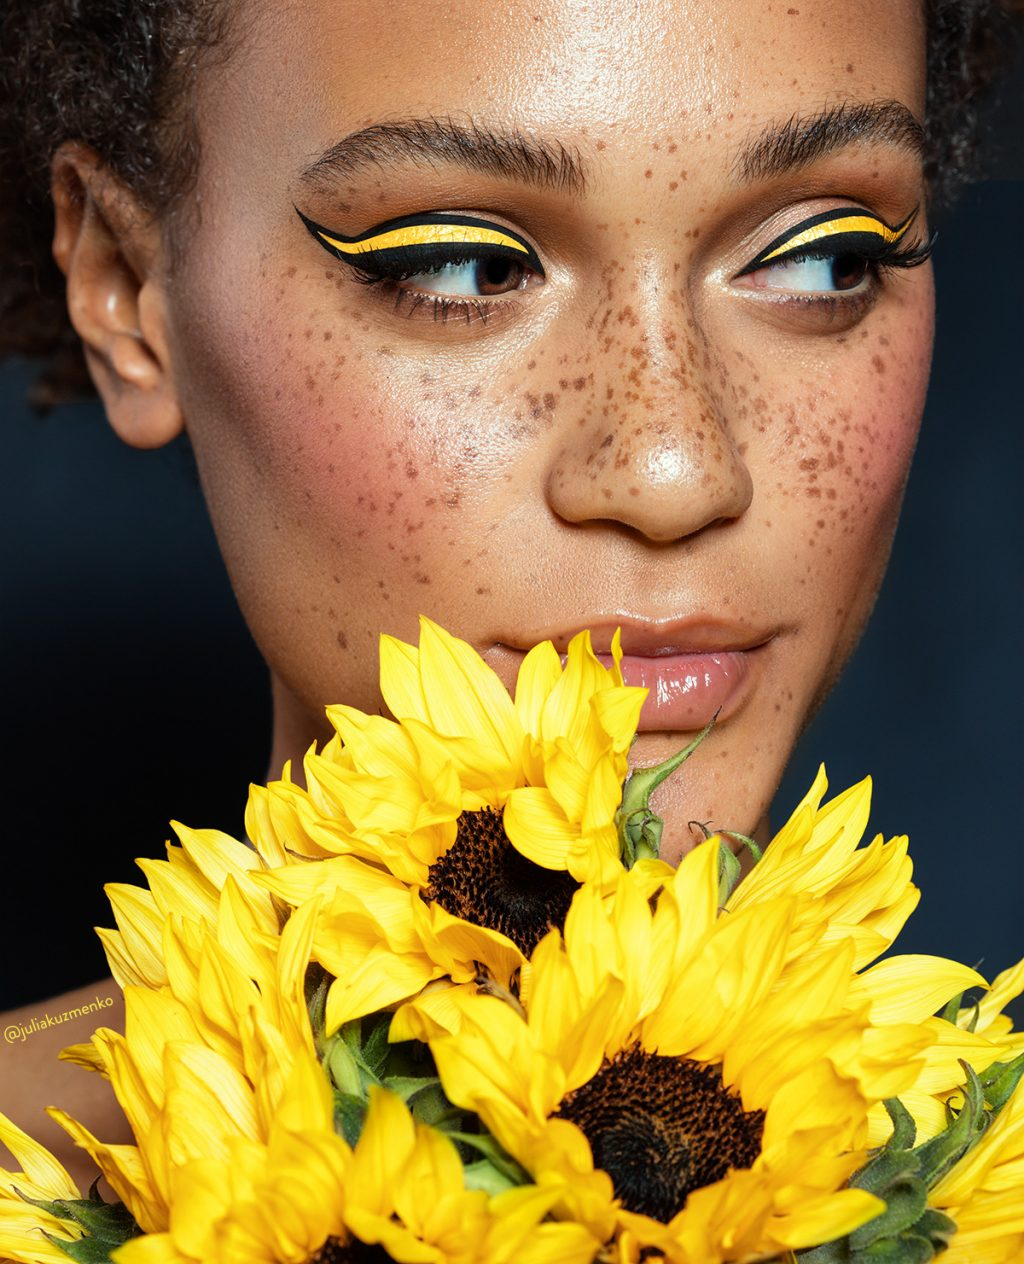 Click to Enlarge. Model: Lauren of NOUS Models, Skin work: Lupe Moreno, Makeup: Vlada Haggerty, Photo & Post: Julia Kuzmenko McKim